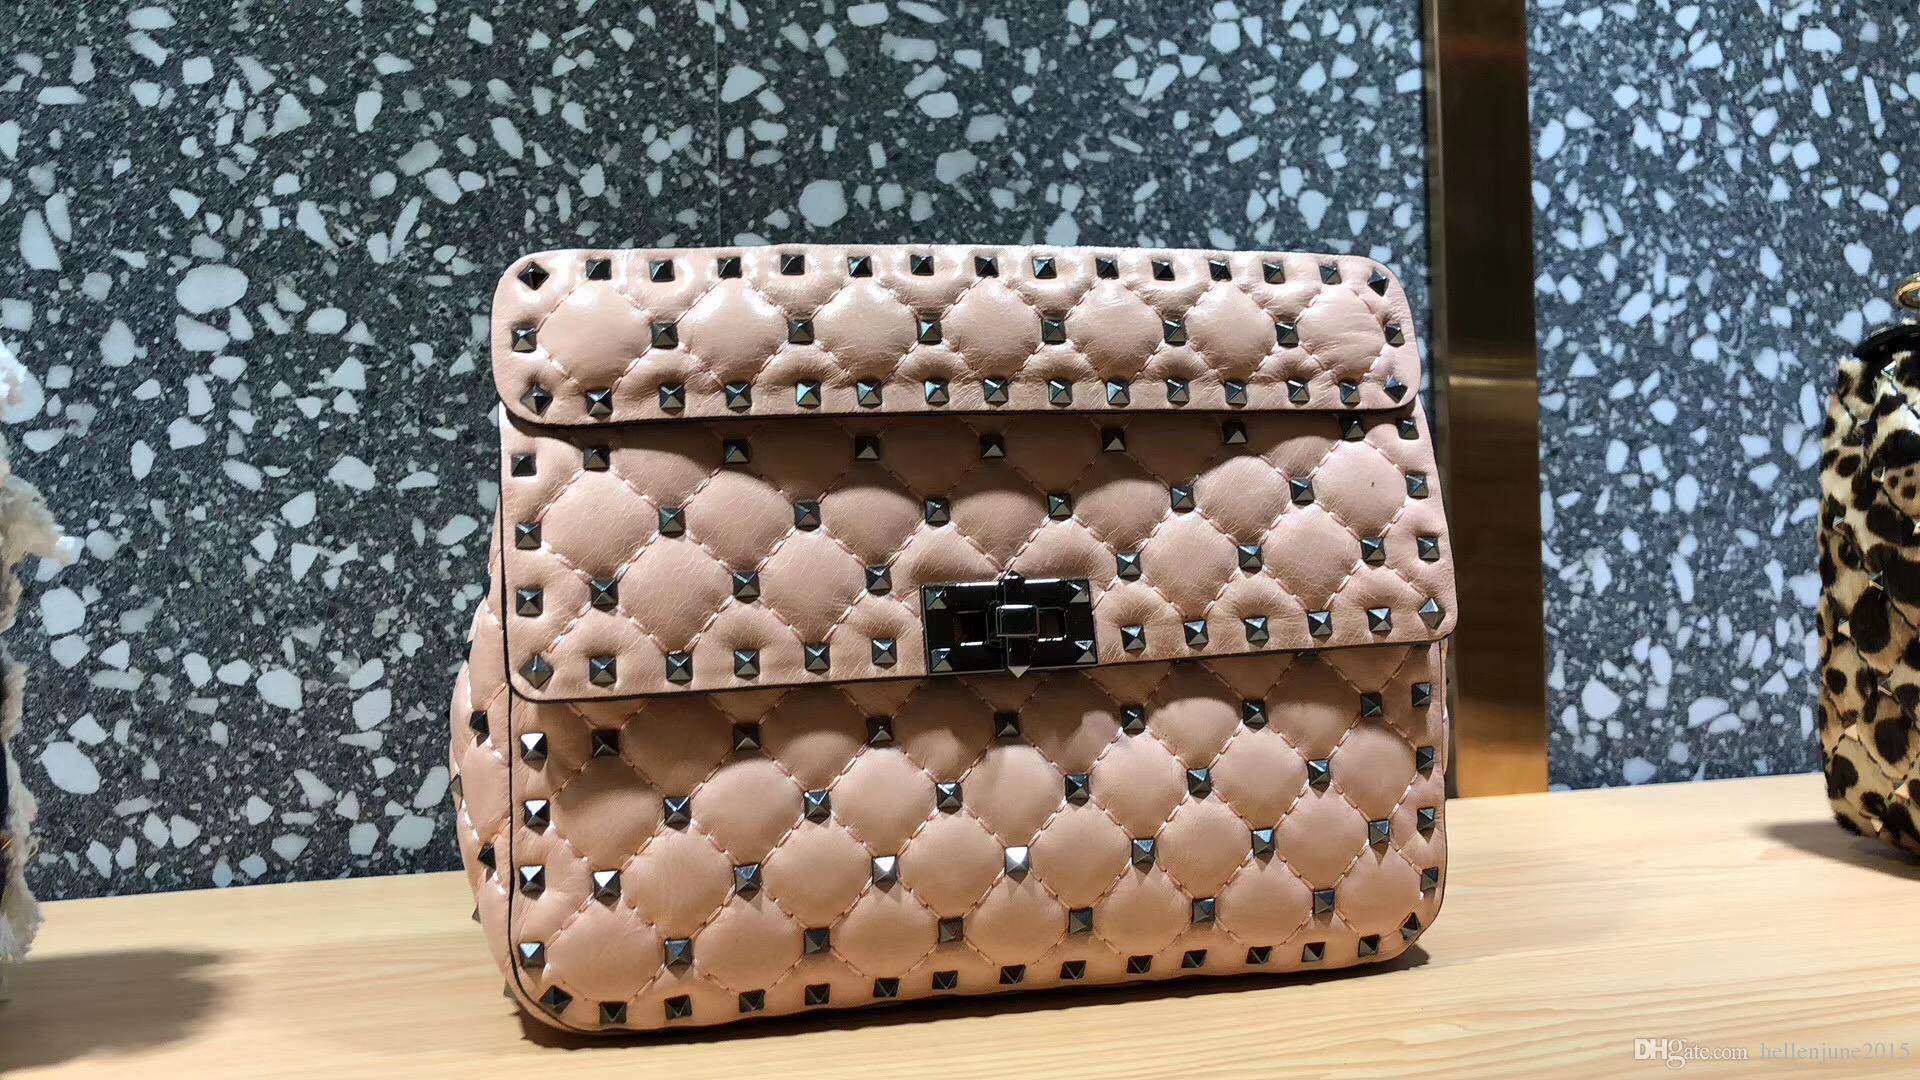 66e7d098aa63 18 New Model Europe Luxury Style Classic Women Messenger Fashion Bag  Diamond Check Women Handbag Mini Shoulder Bag Rivet Decoration Leather Totes  Jo Totes ...